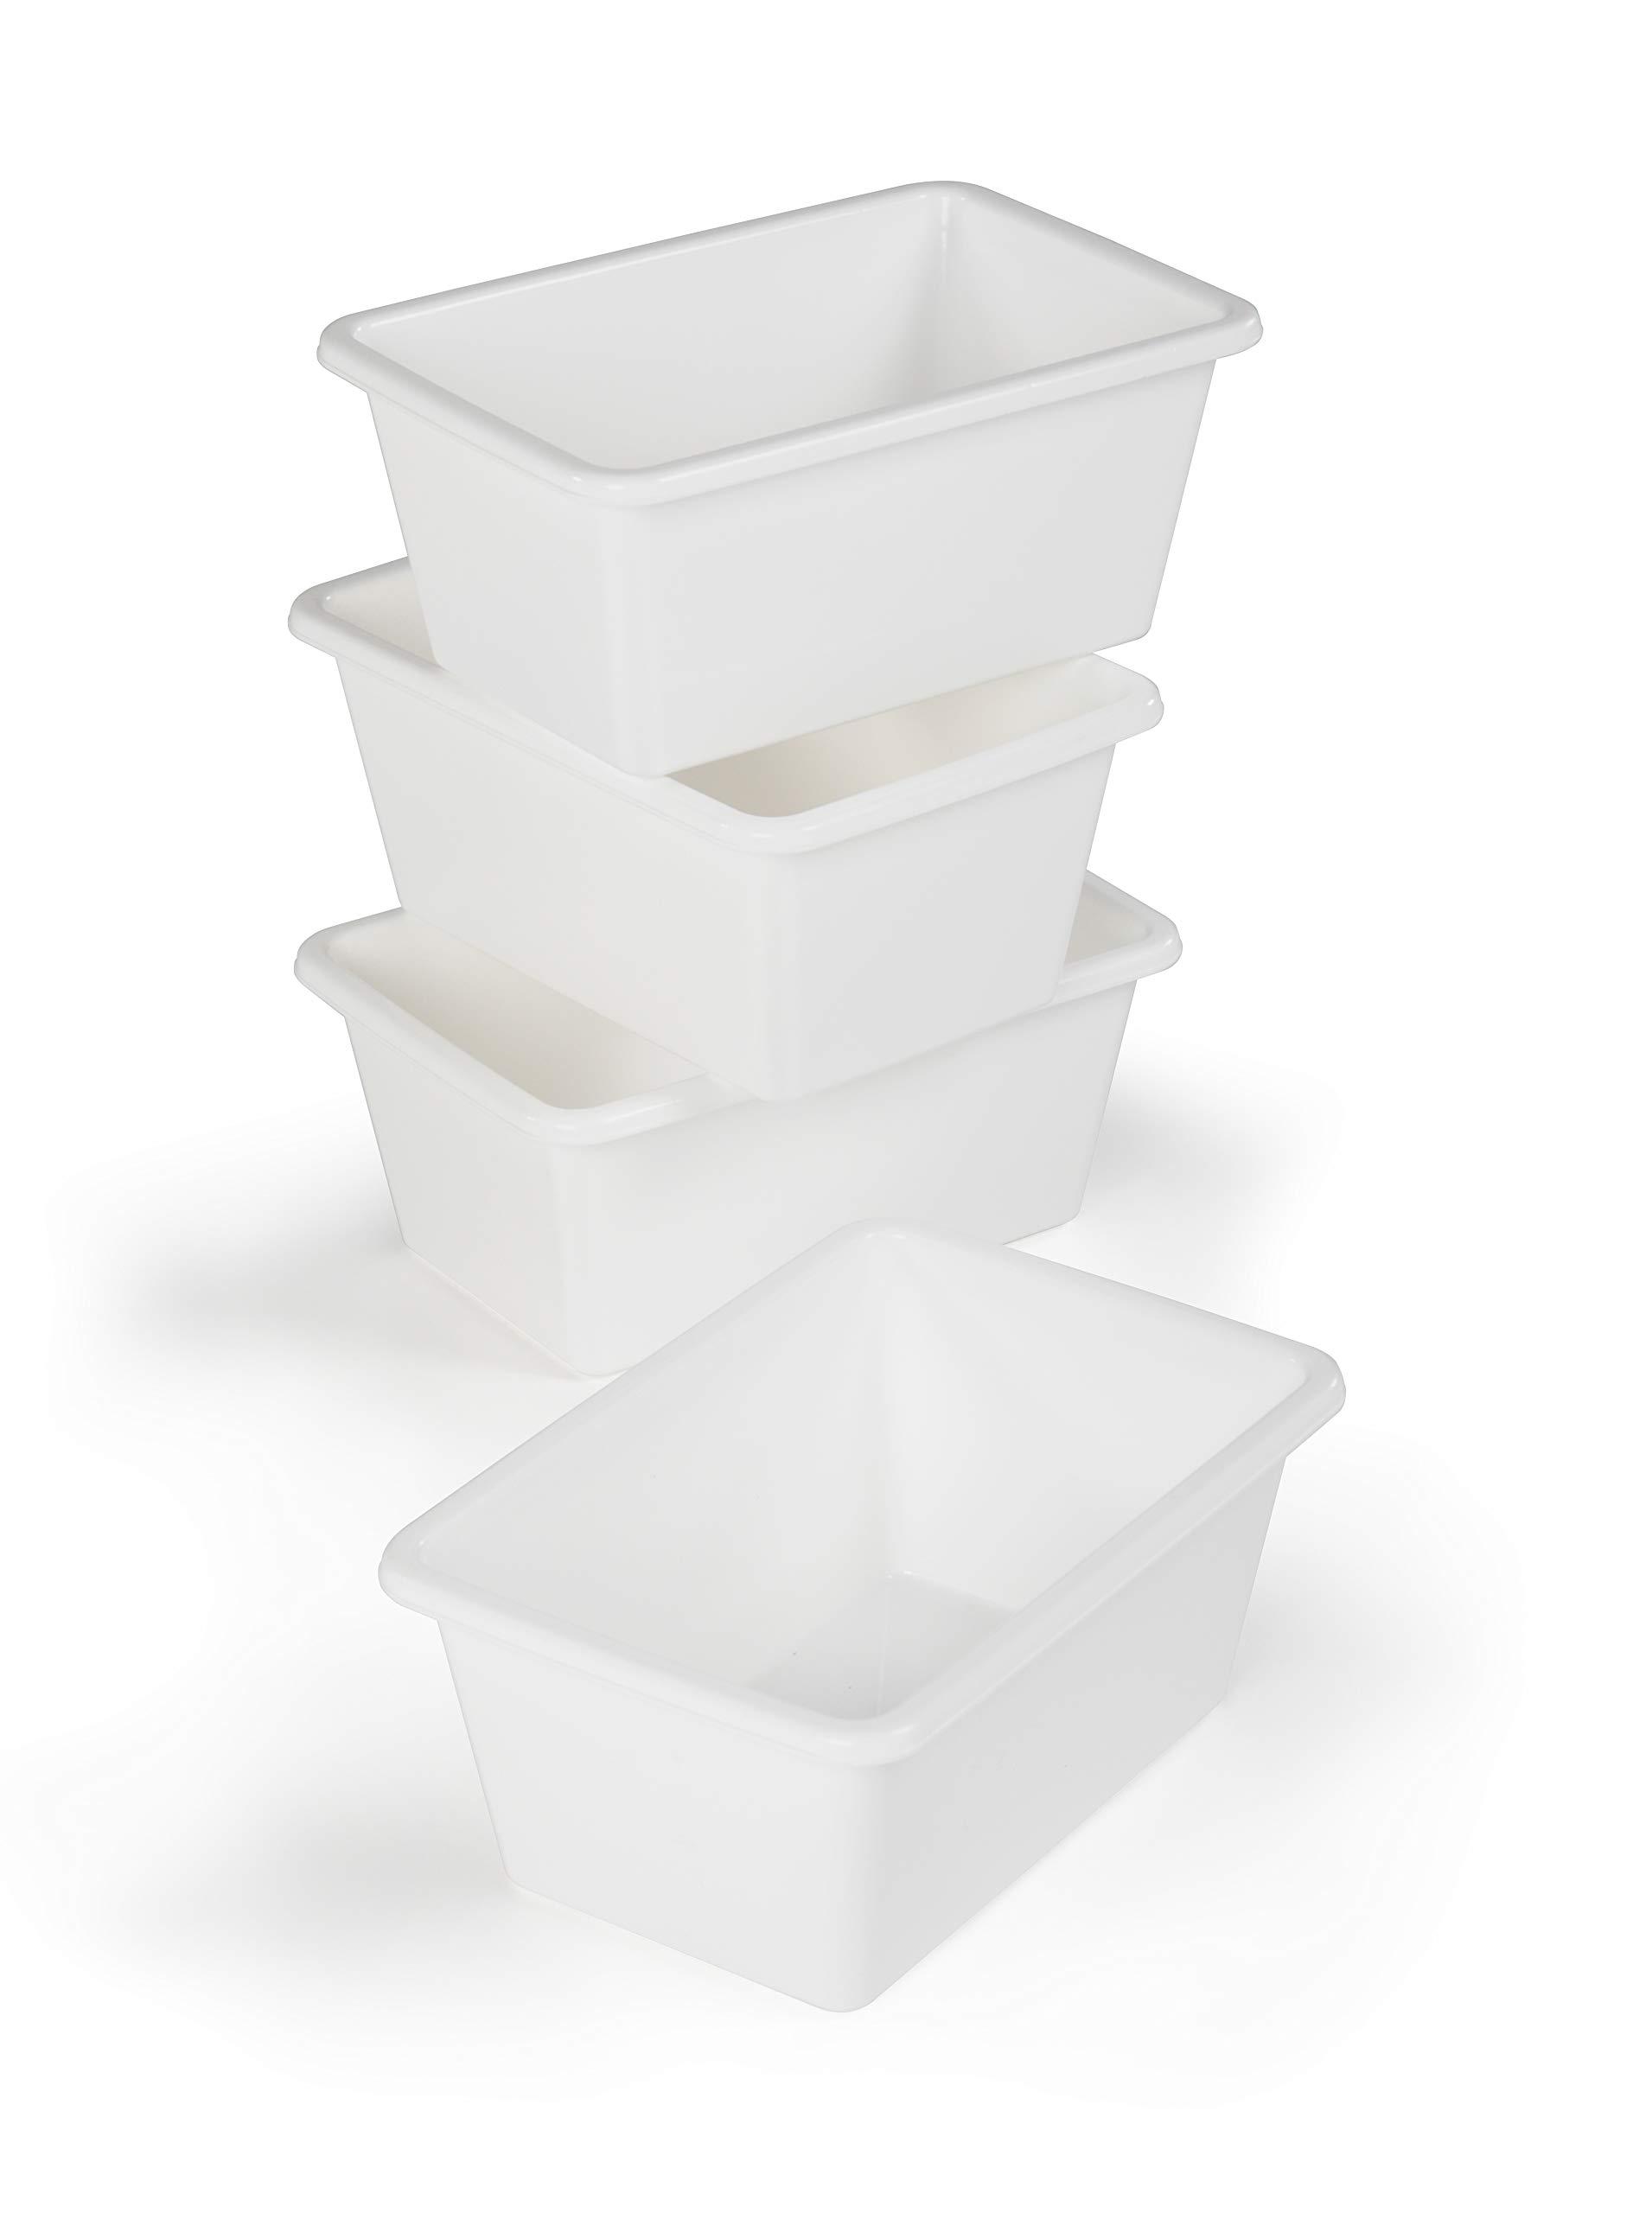 Humble Crew (White) Plastic Storage Bins, Small, Set of 4